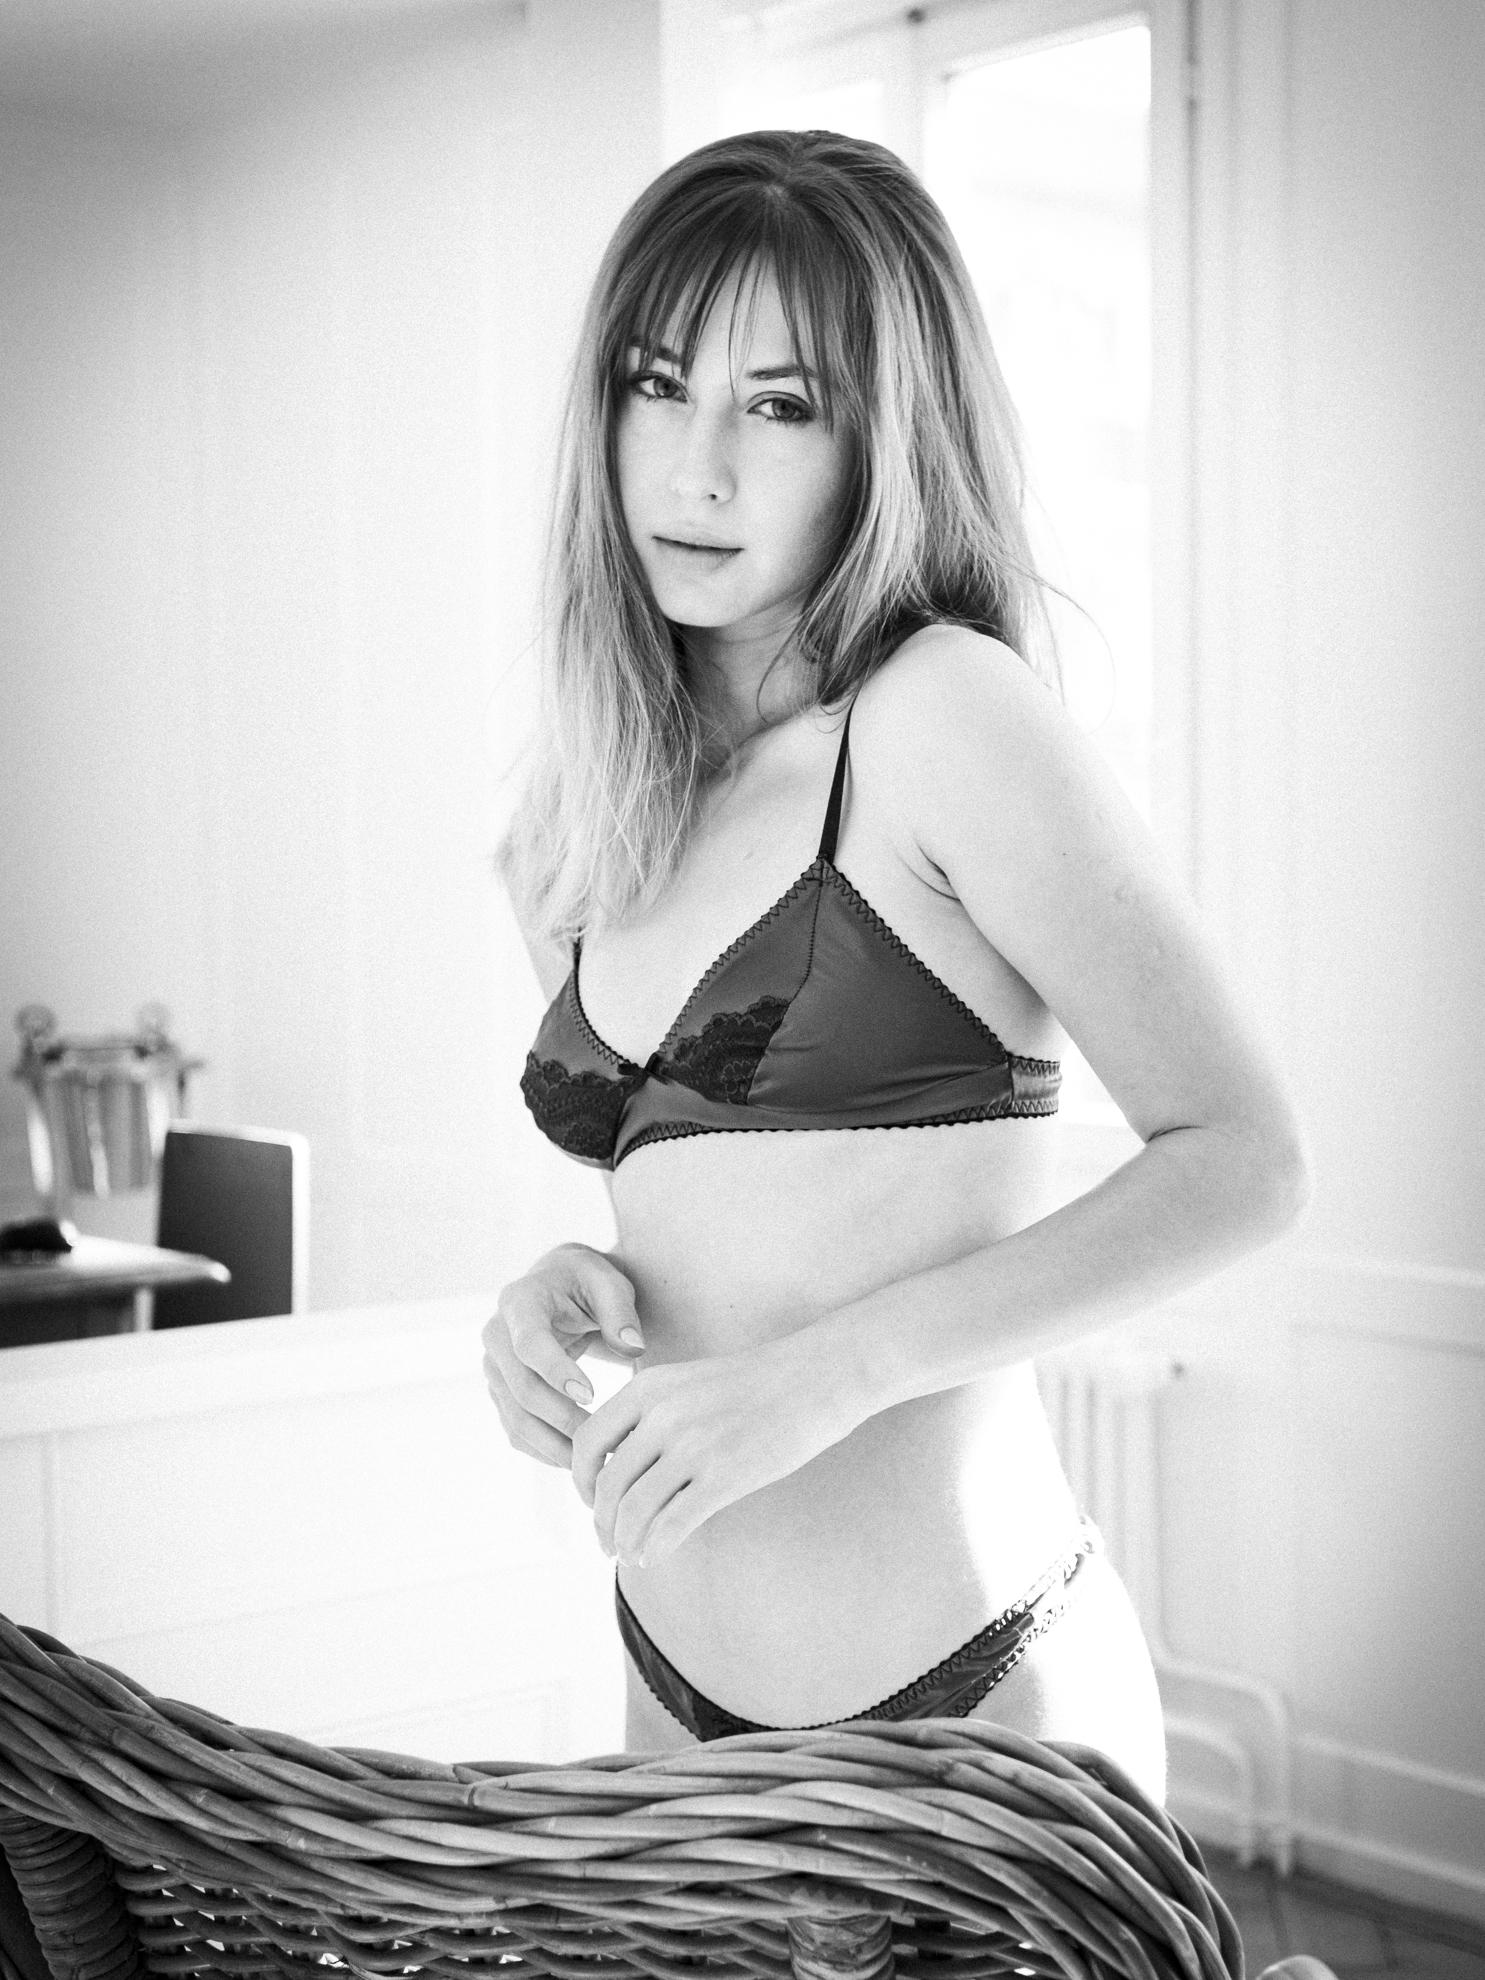 Diana_Lark_by_Chris_Wunderlich_04__3